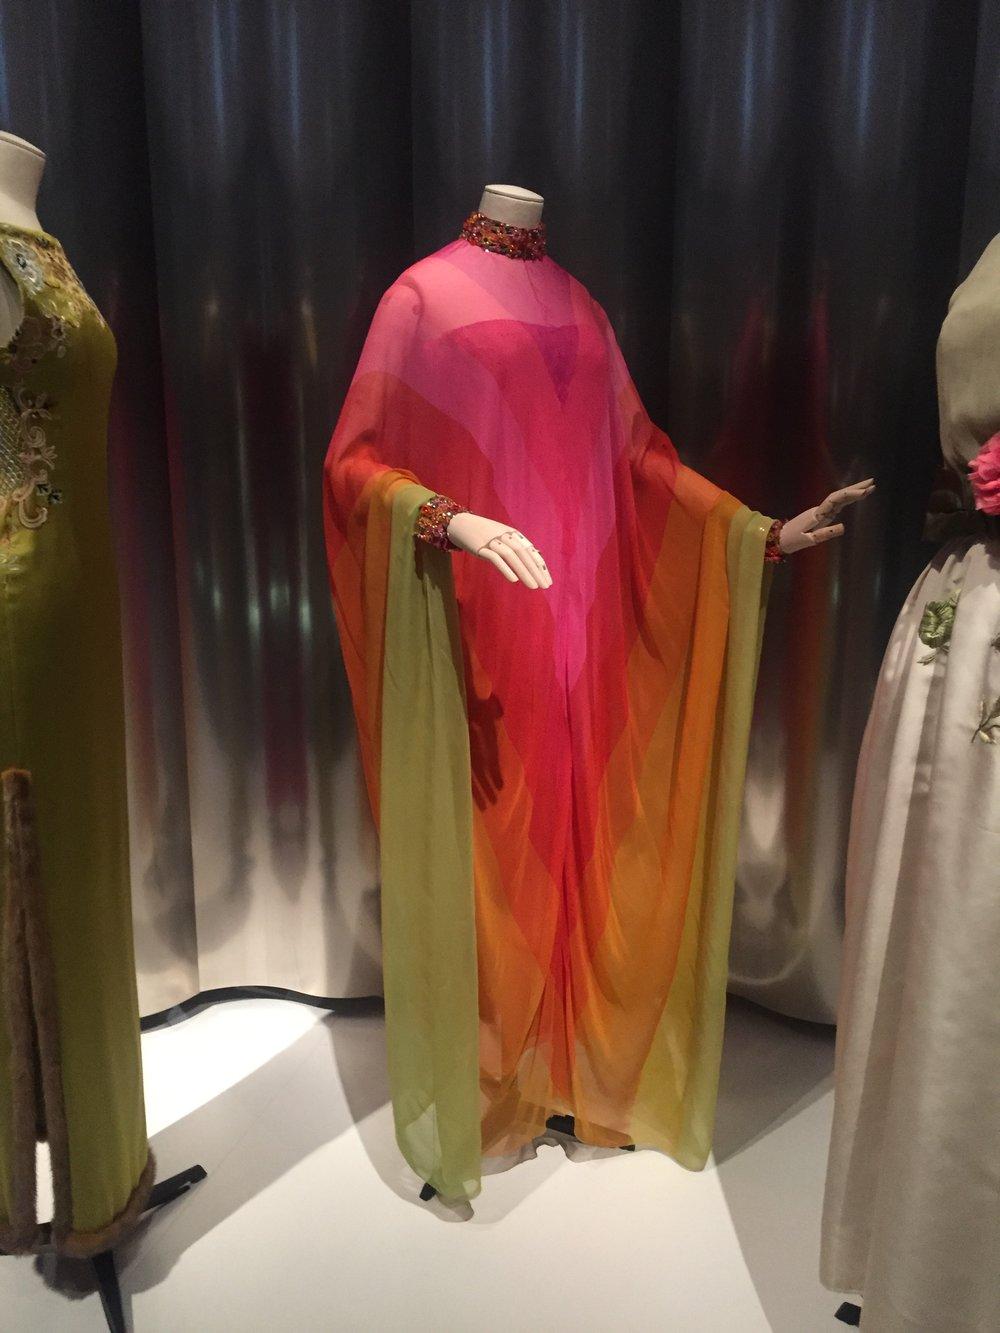 Dior's third artistic designer, Marc Bohan, made this pop art floor-length chiffon evening dress for Haute Couture Spring-Summer 1967